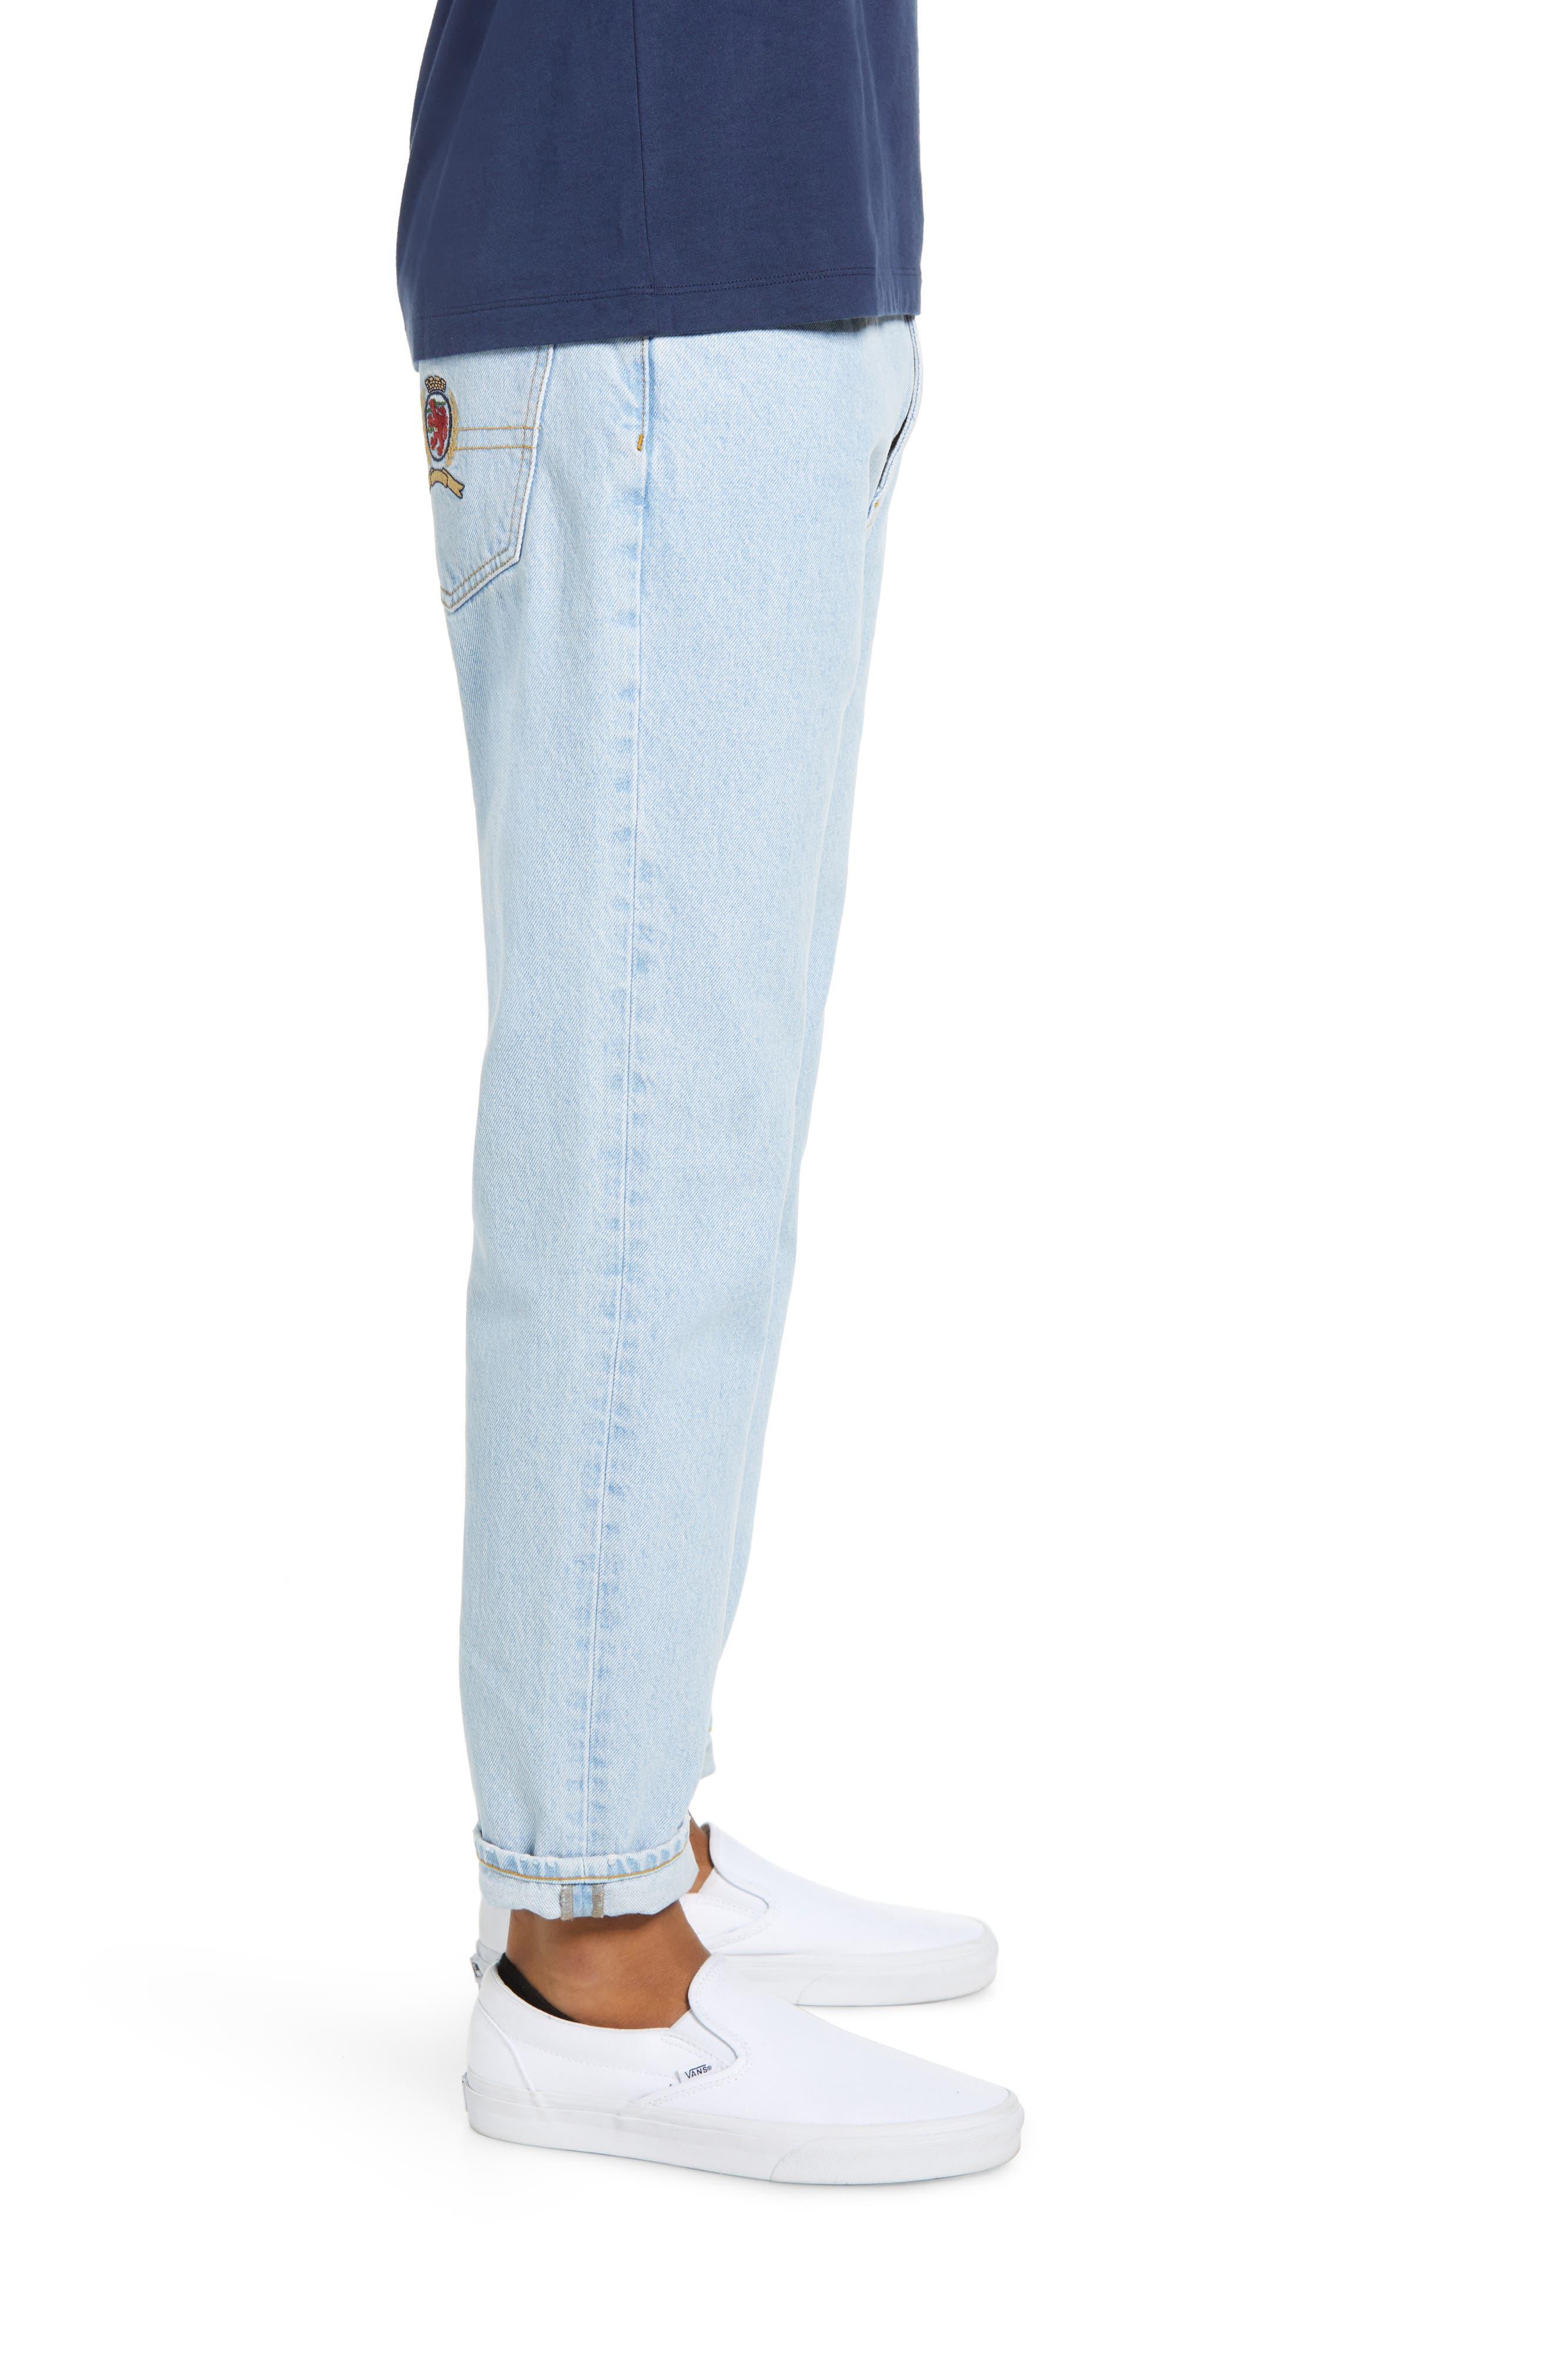 Crest Straight Leg Dad Jeans,                             Alternate thumbnail 3, color,                             LIGHT BLUE DENIM